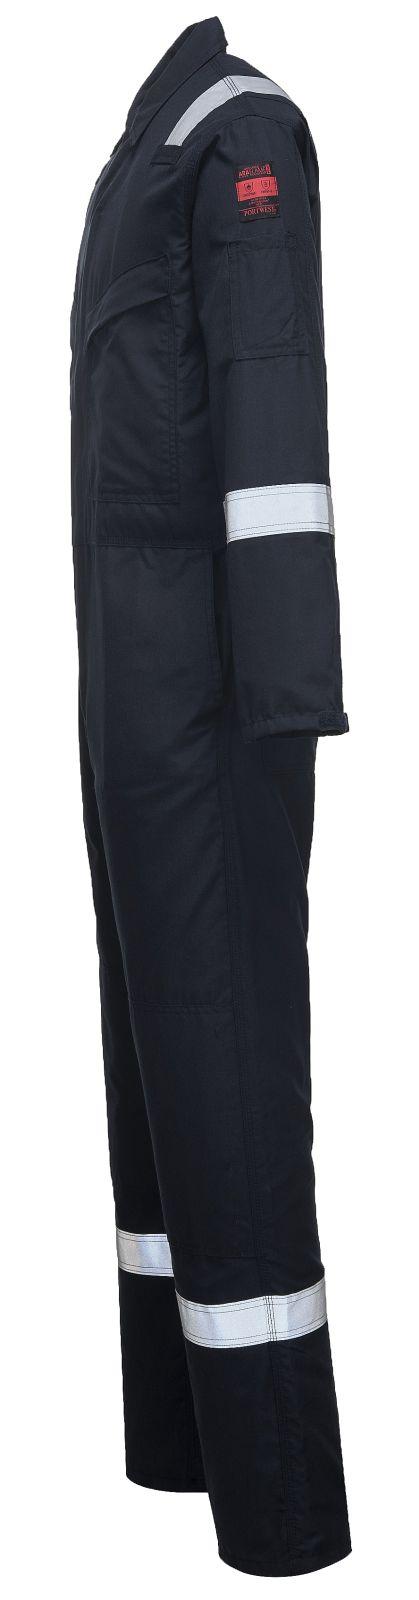 Portwest Araflame Overalls AF53 marineblauw(NA)